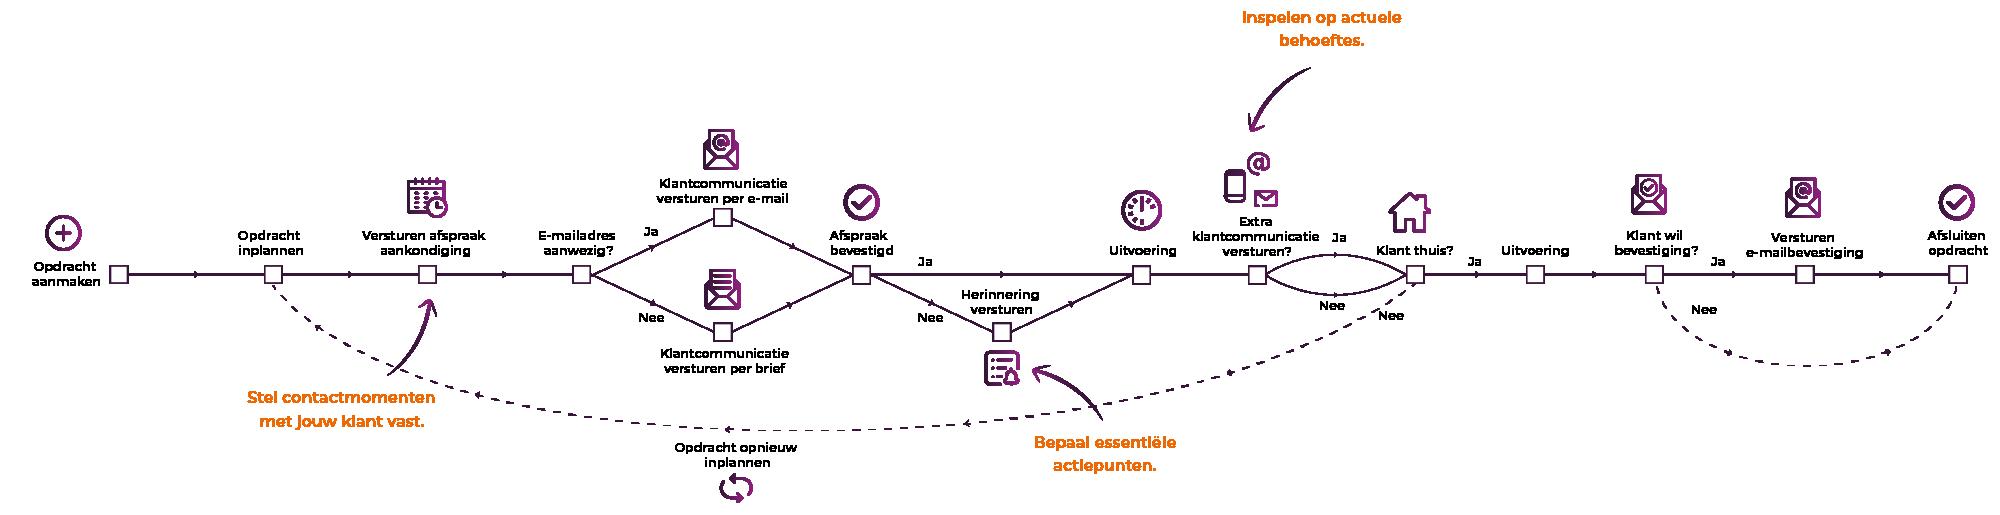 Workflow BPMN model